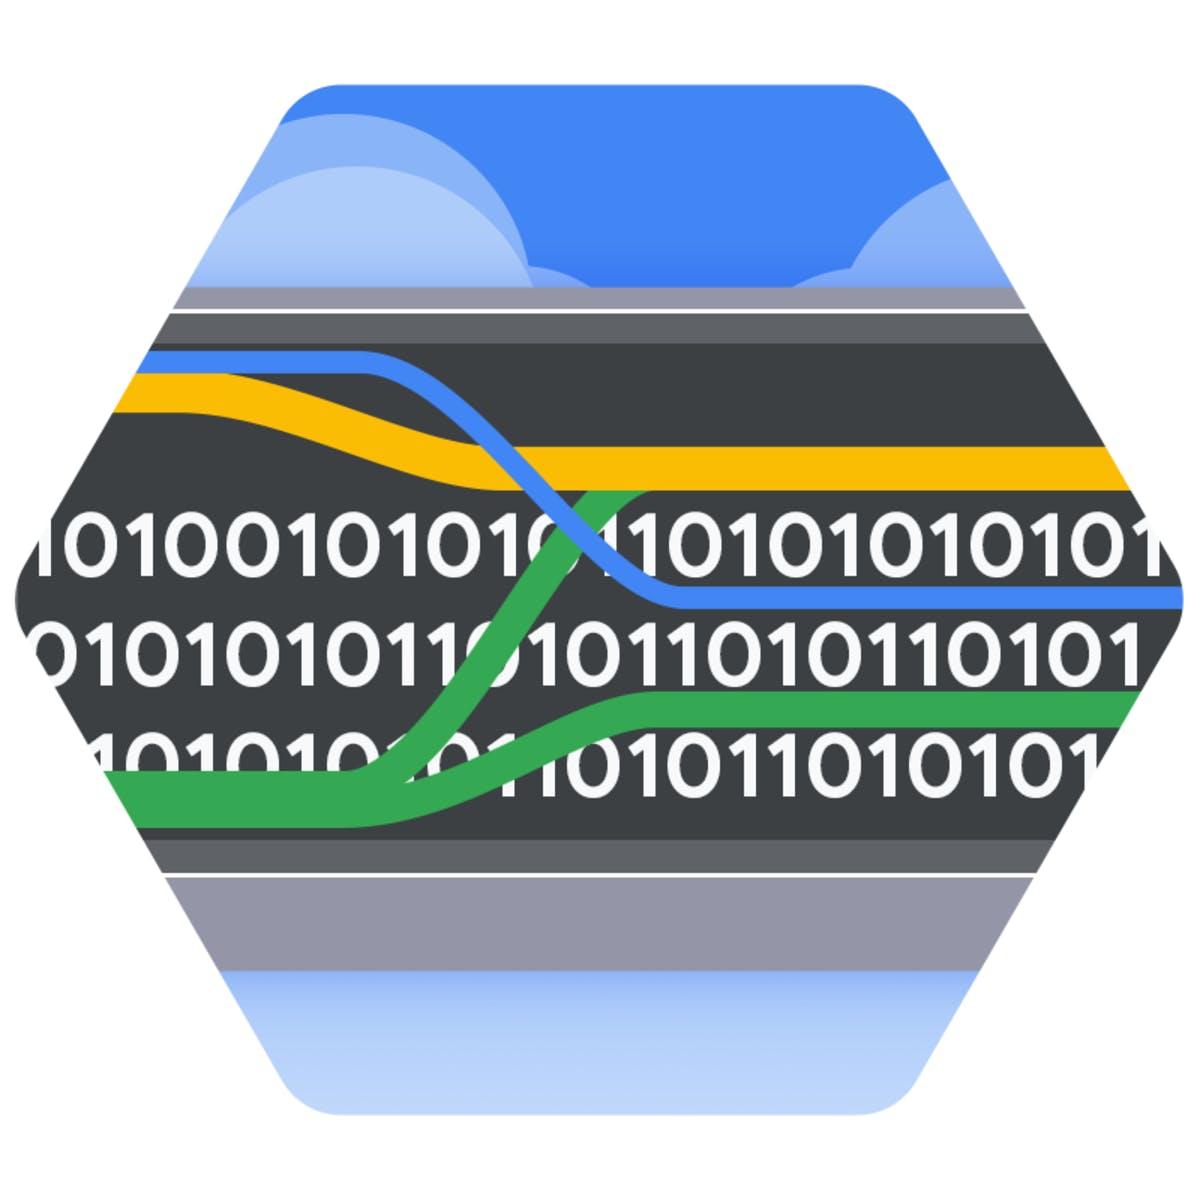 Preparing for the Google Cloud Professional Data Engineer Exam